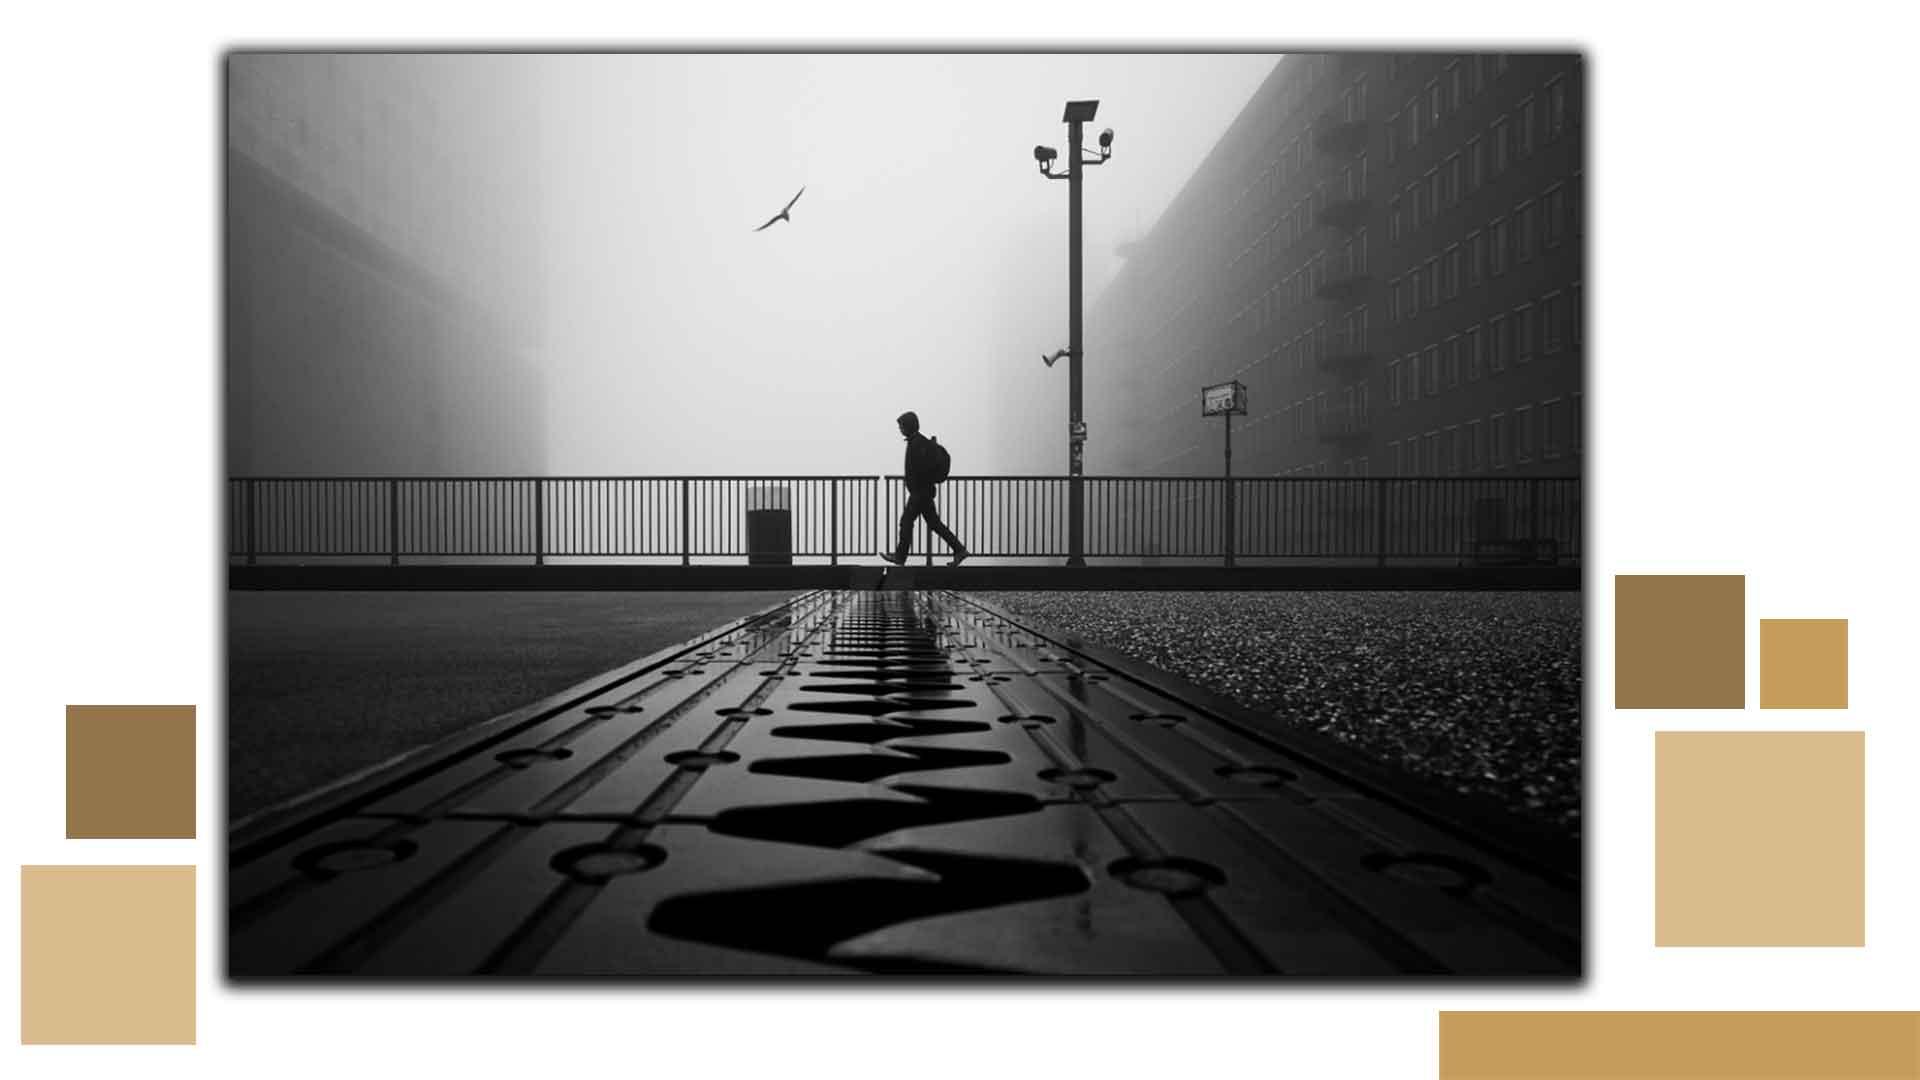 Black and White World 6 - چگونه می توان تصاویر را تک رنگ فرض کرد؟